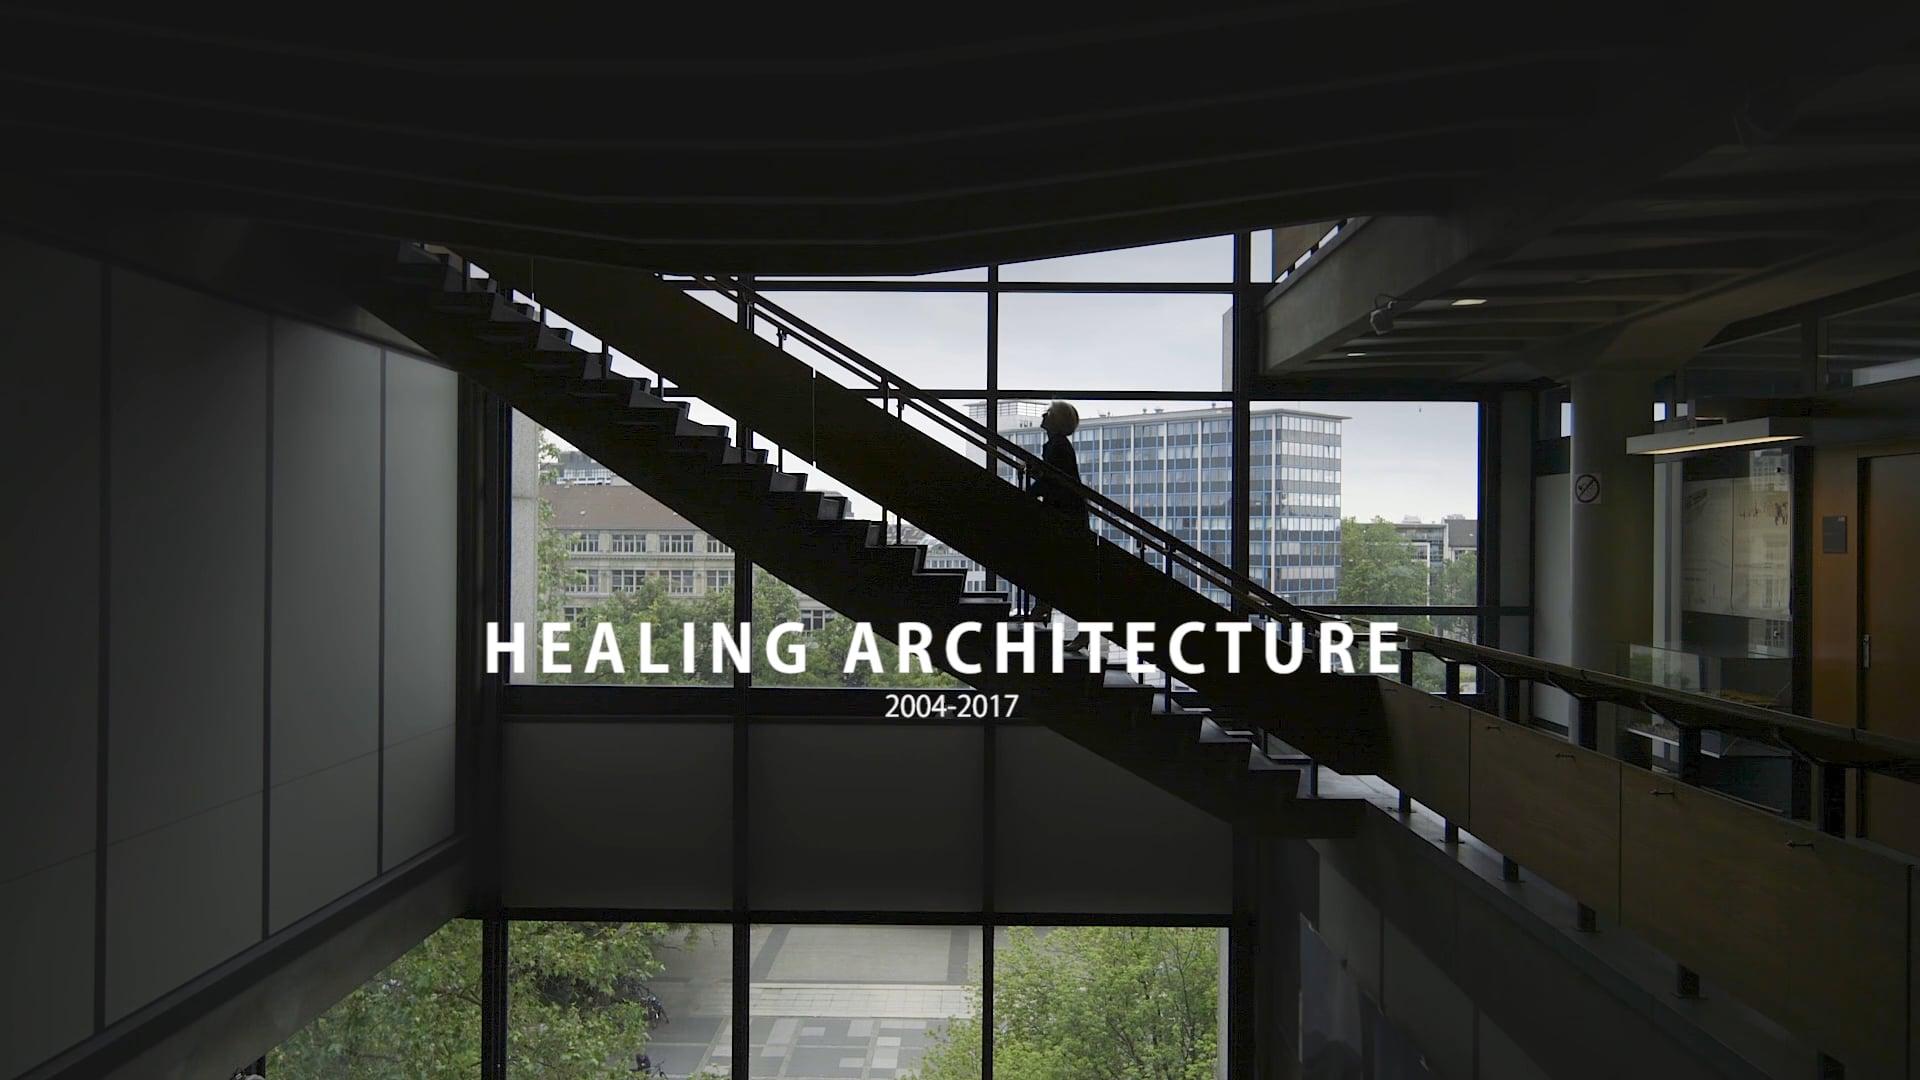 Nickl & Partner - HEALING ARCHITECTURE